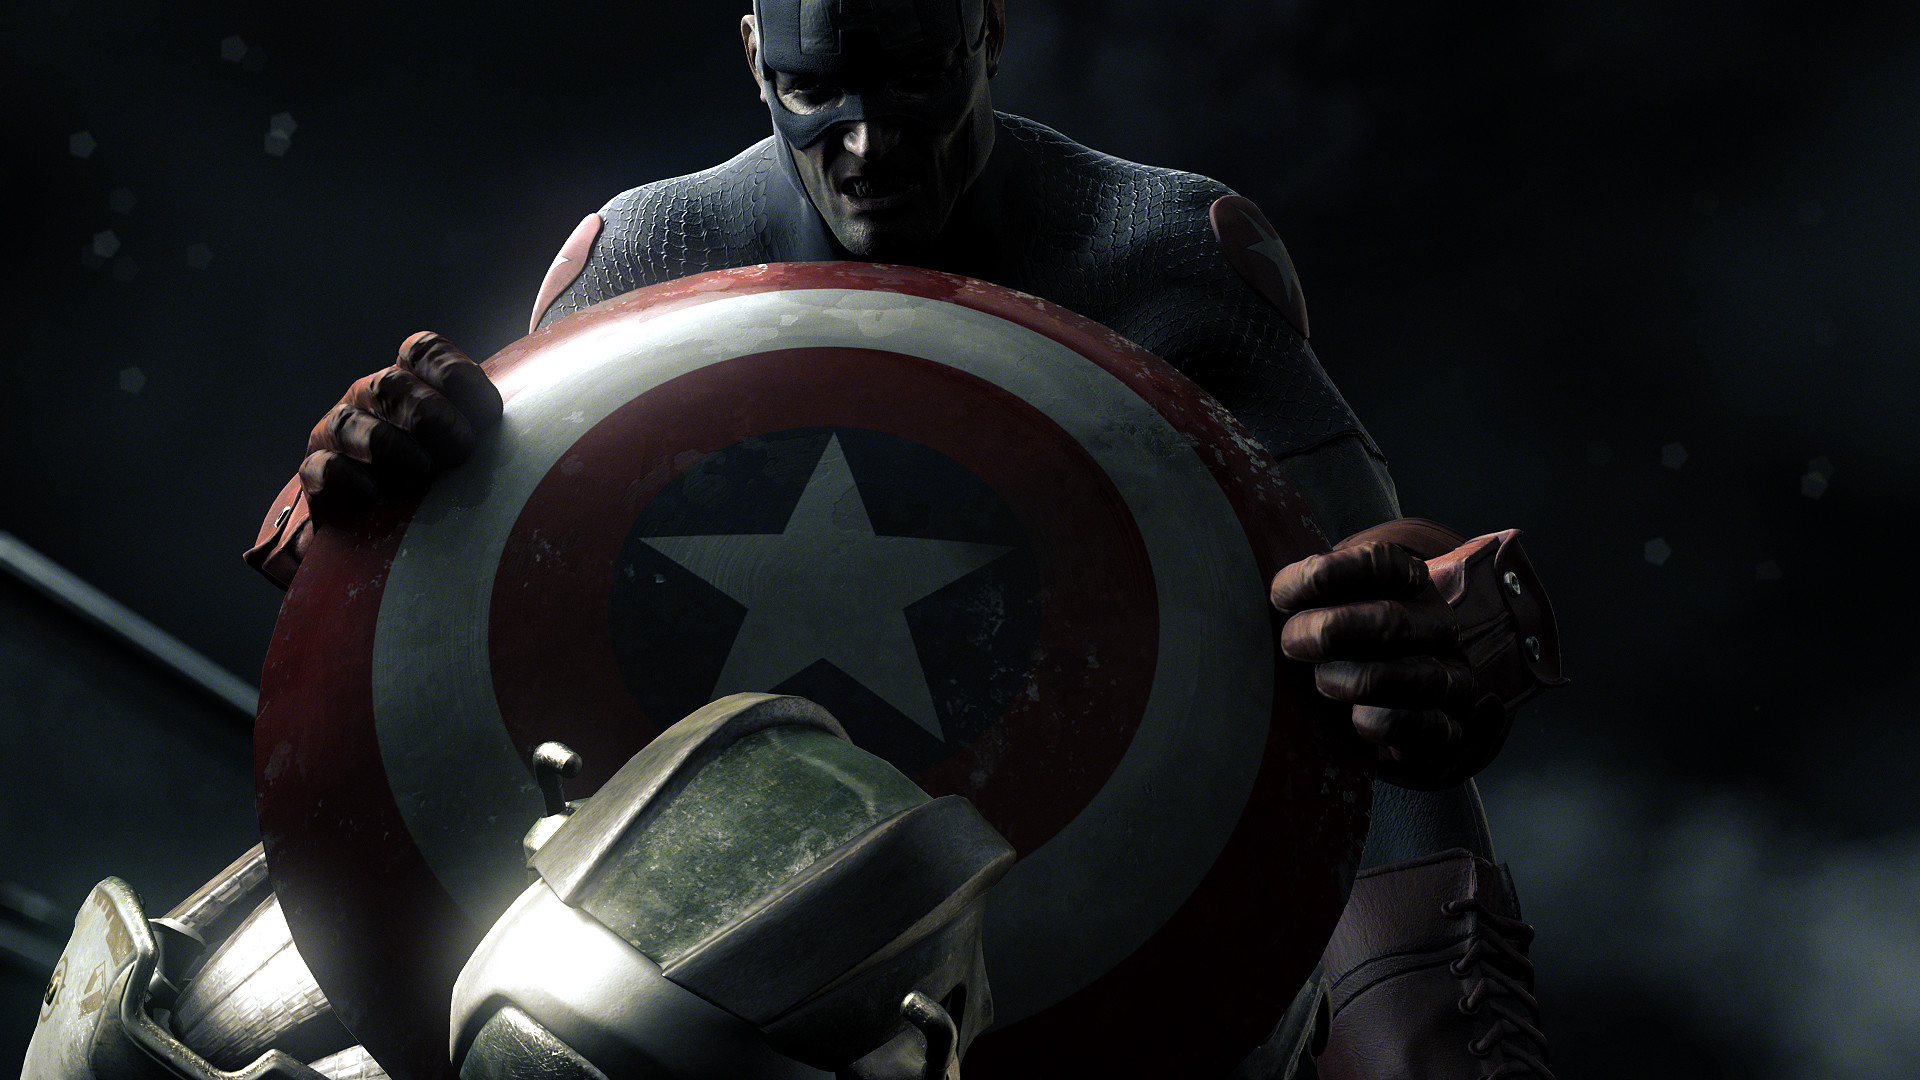 Hd marvel wallpapers for desktop 58 images - Marvel android wallpaper hd ...